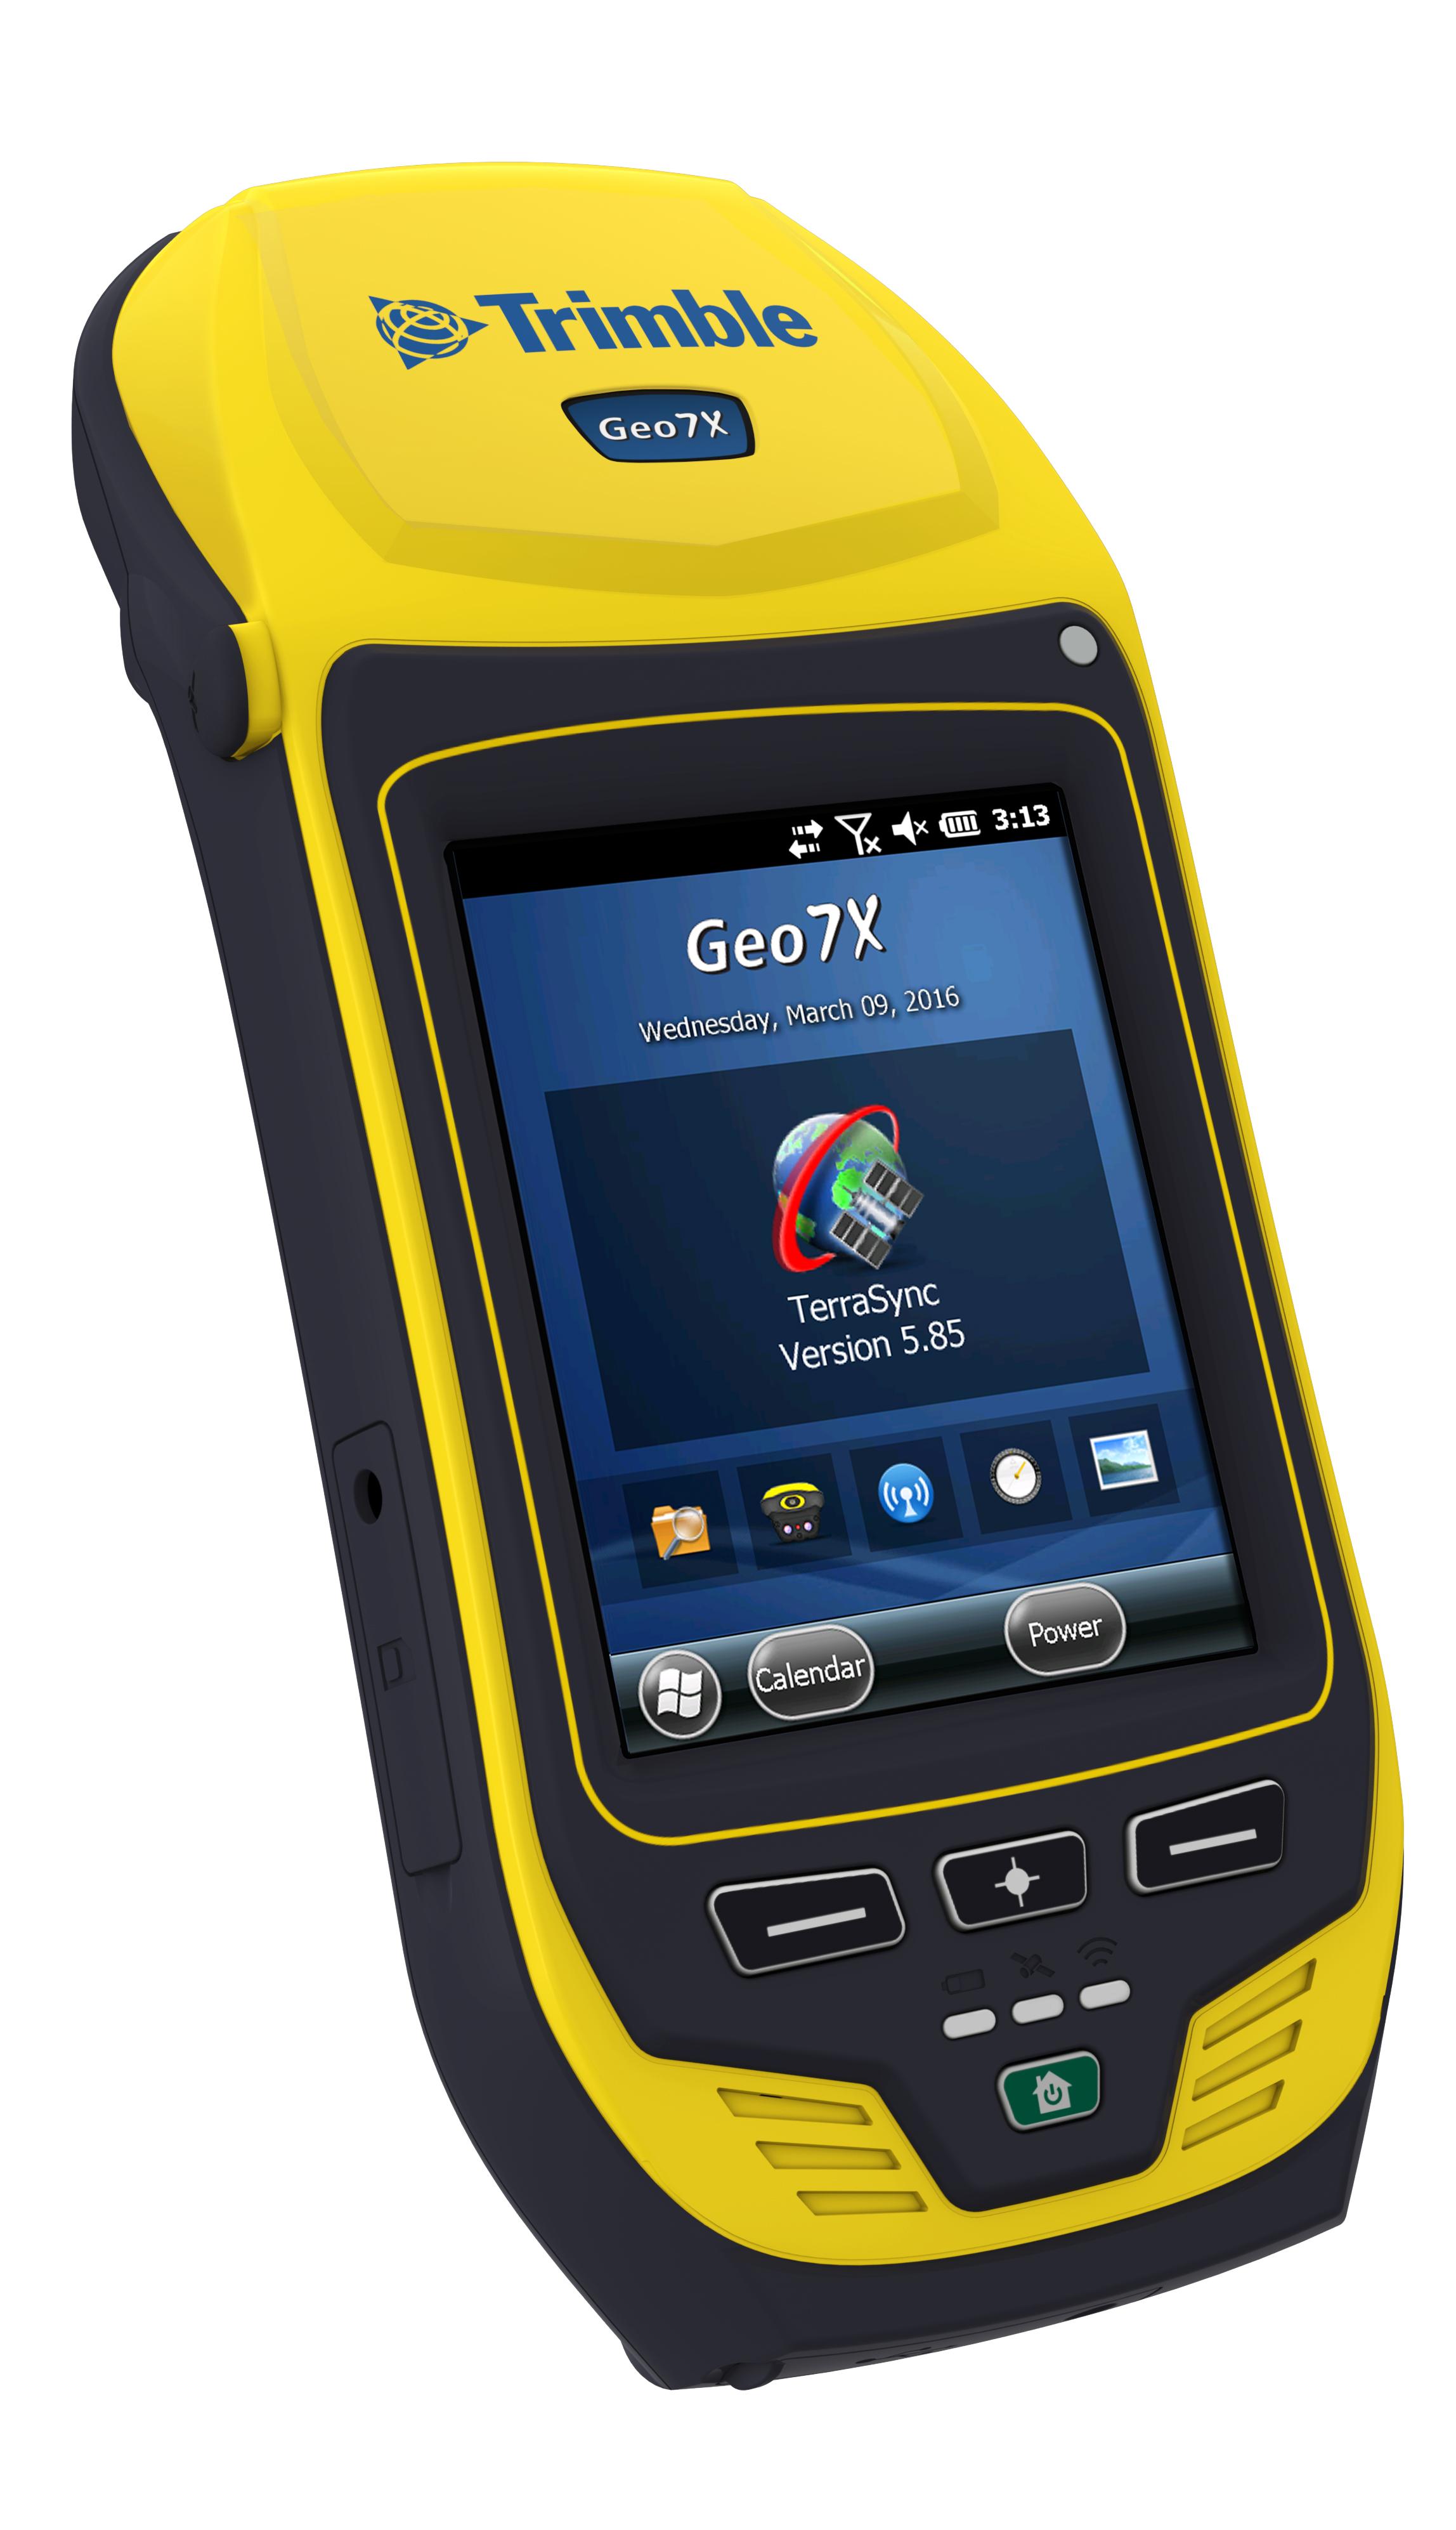 Trimble Geo 7x Handheld With Trimble Access Software